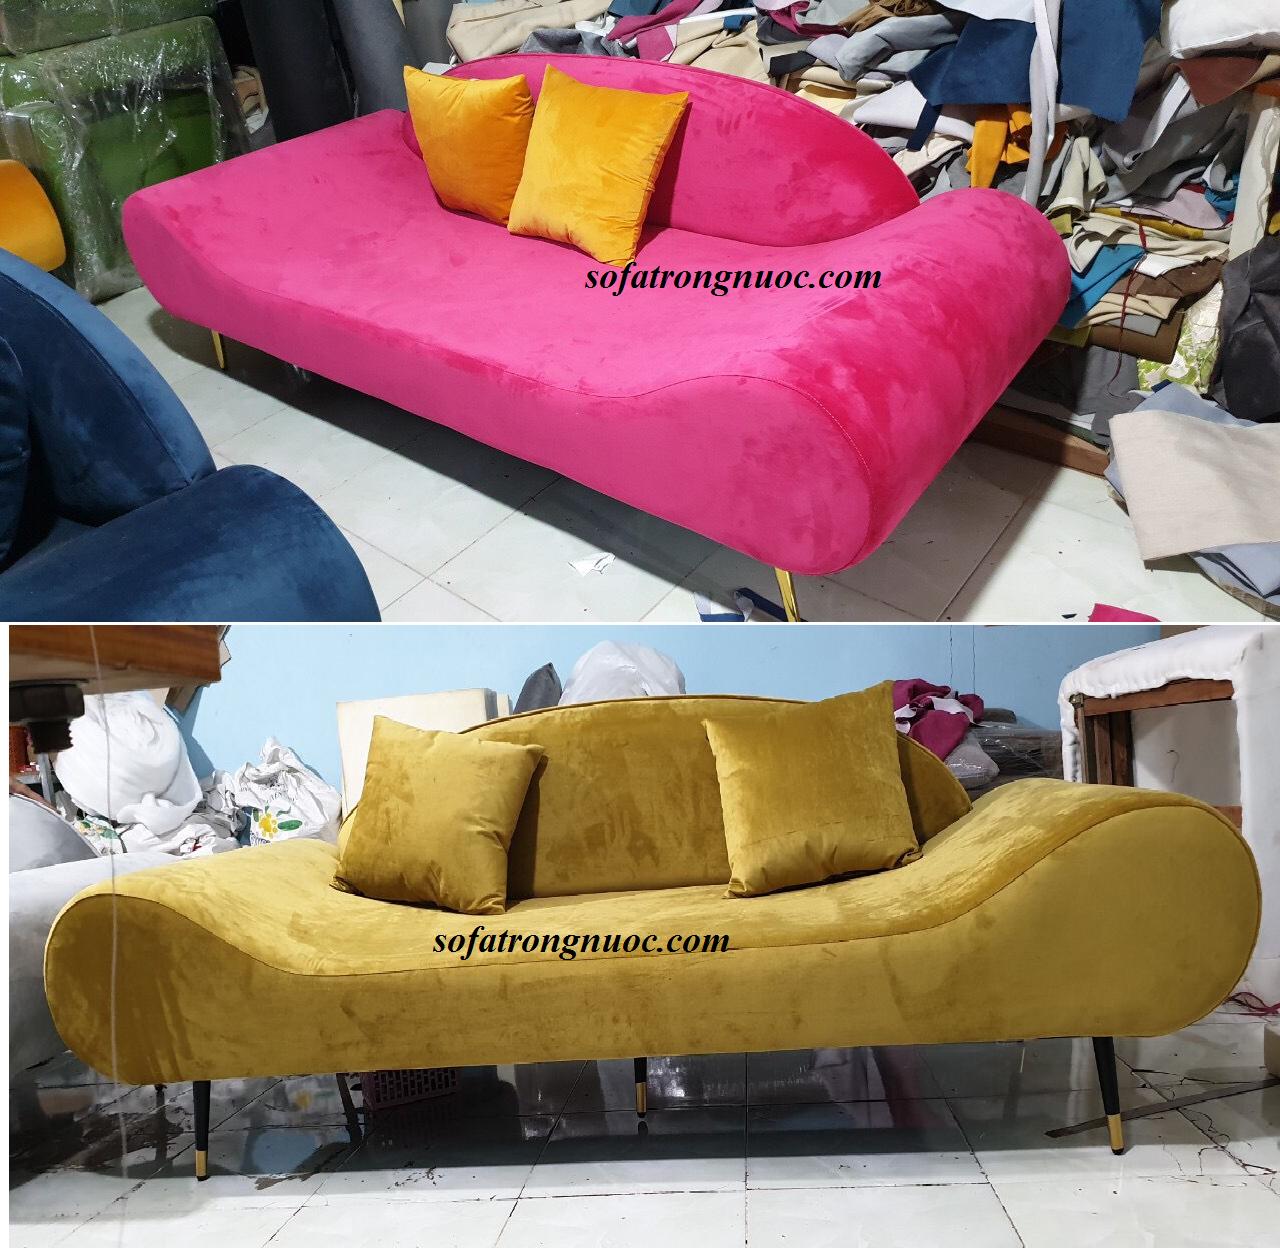 sofa-băng-re